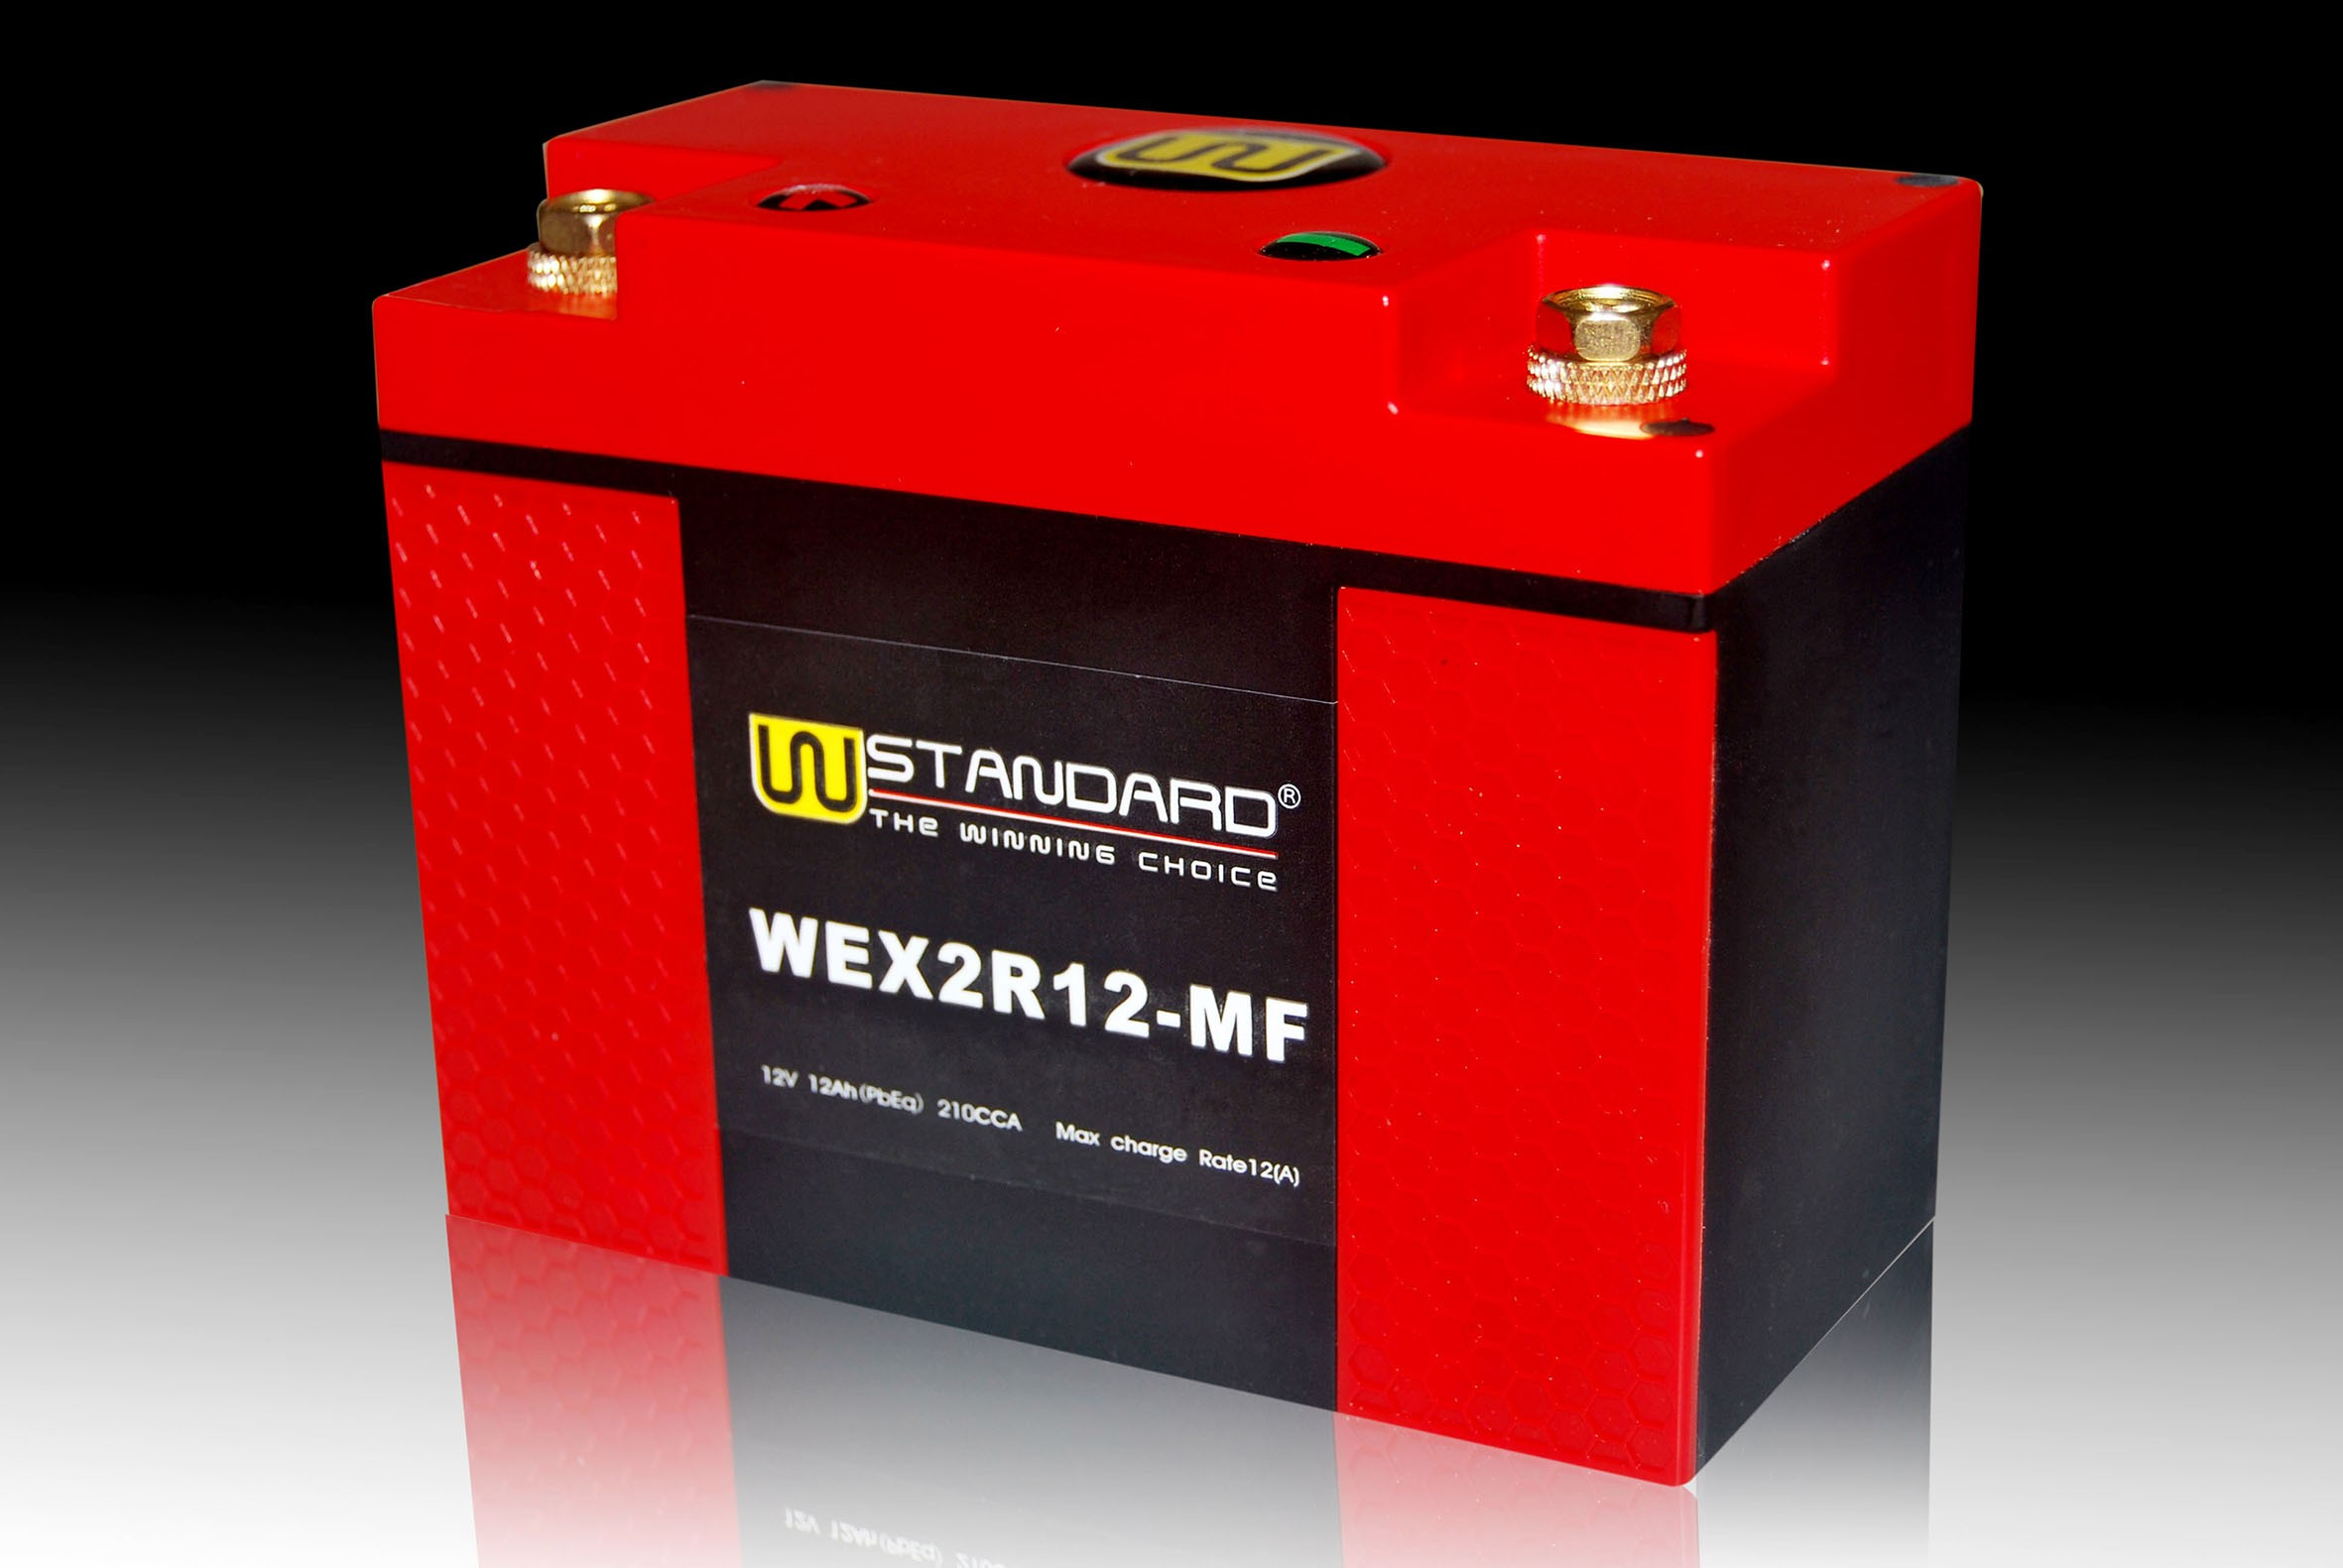 WEX2R12-MF